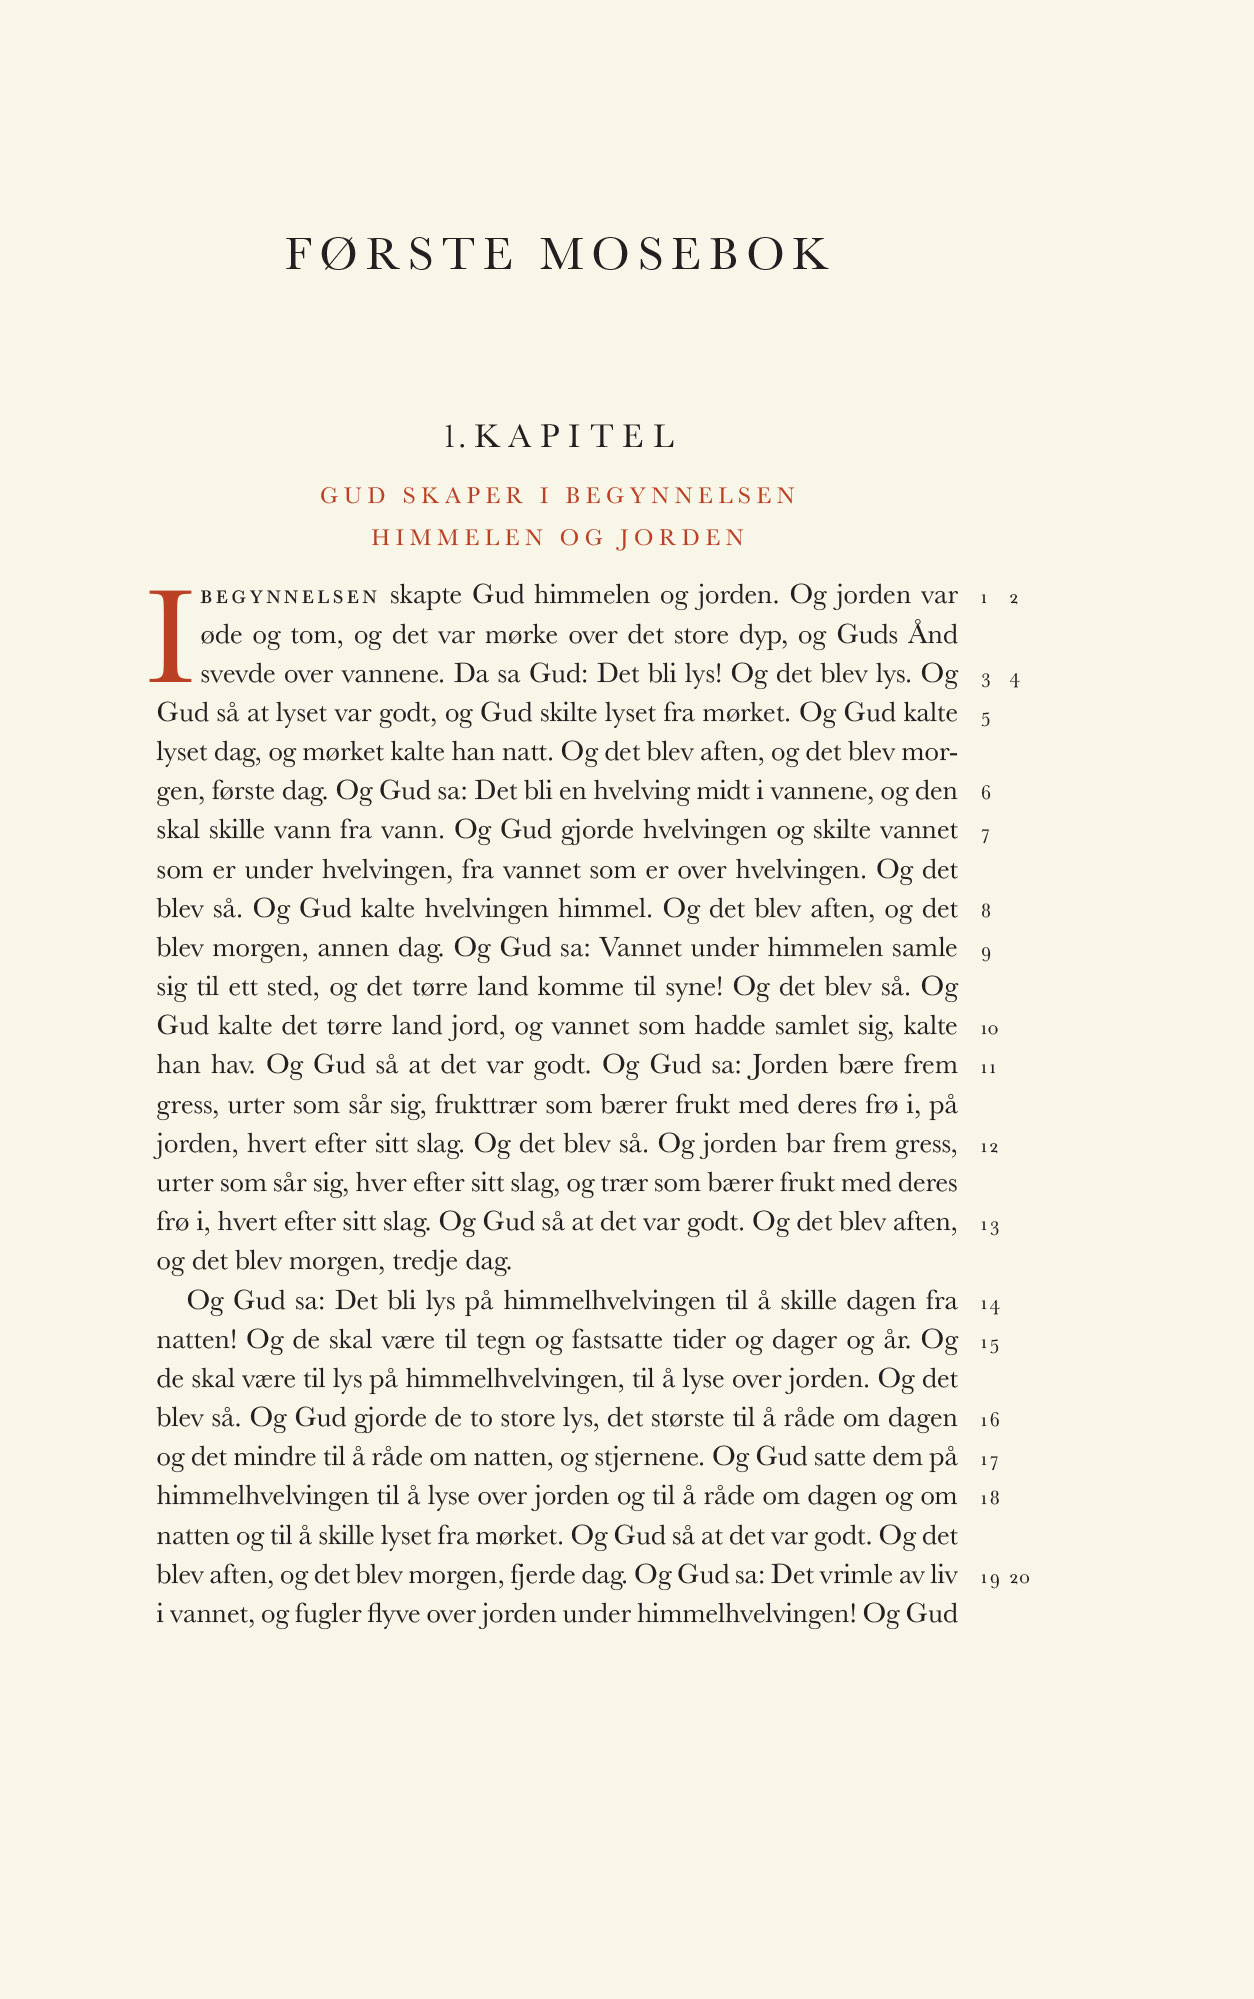 KJELL ARMAND JOHANSEN  Sarpsborg, Norway, 1955  Baskerville  17 X 27 cm  Letterpress  Liber Librorum Collection